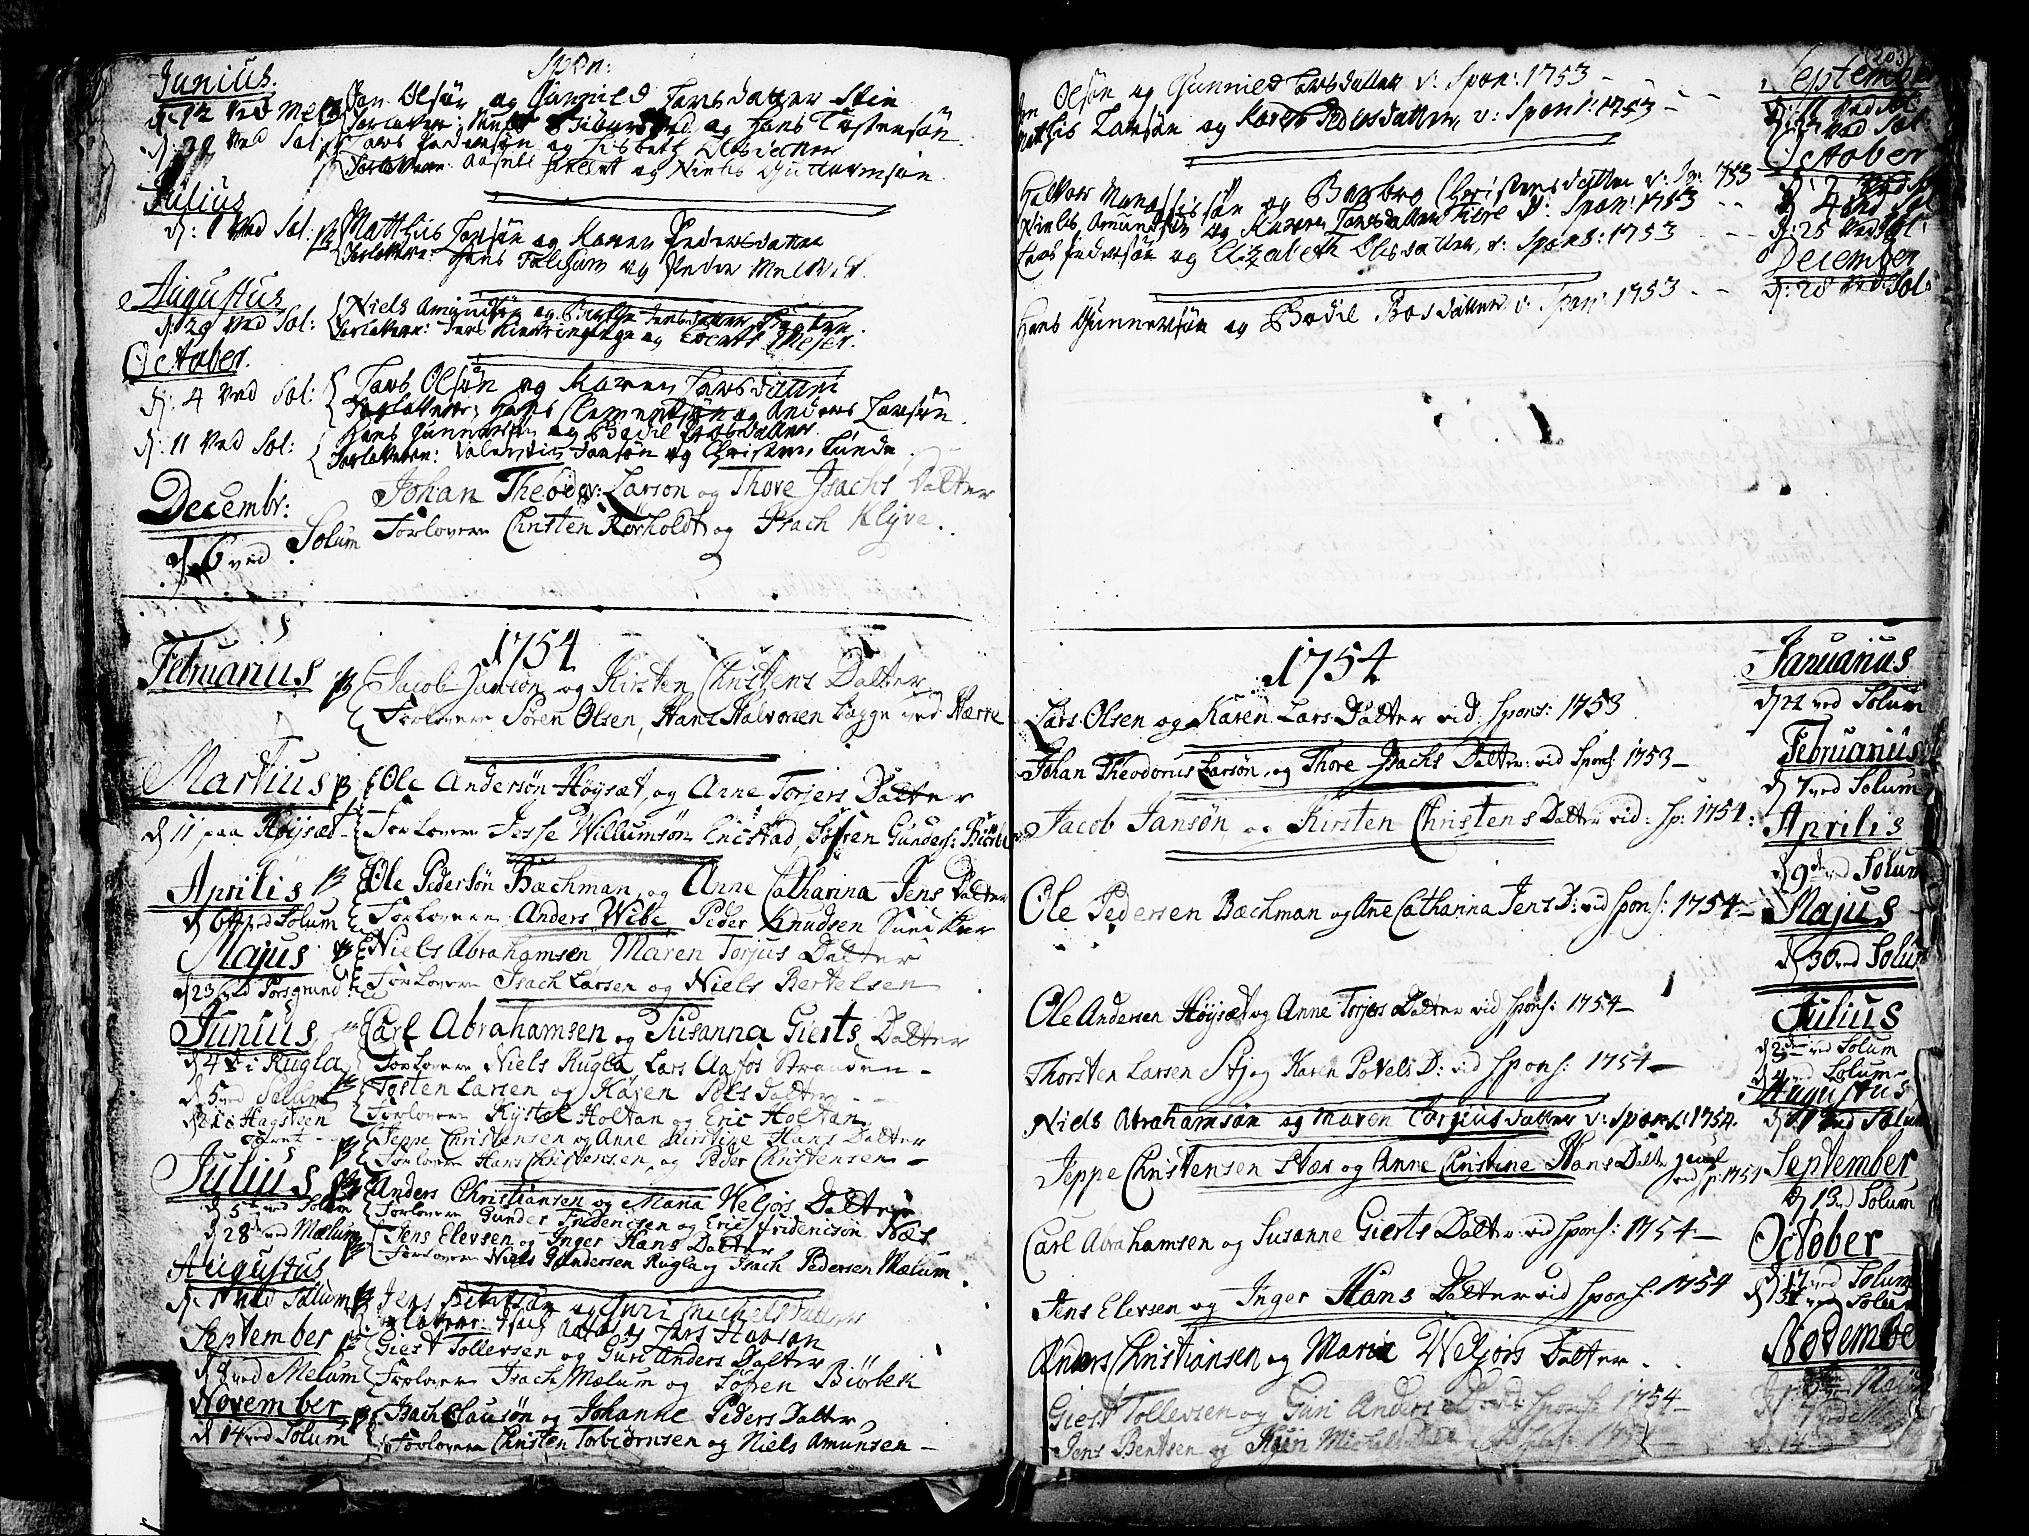 SAKO, Solum kirkebøker, F/Fa/L0002: Ministerialbok nr. I 2, 1713-1761, s. 203